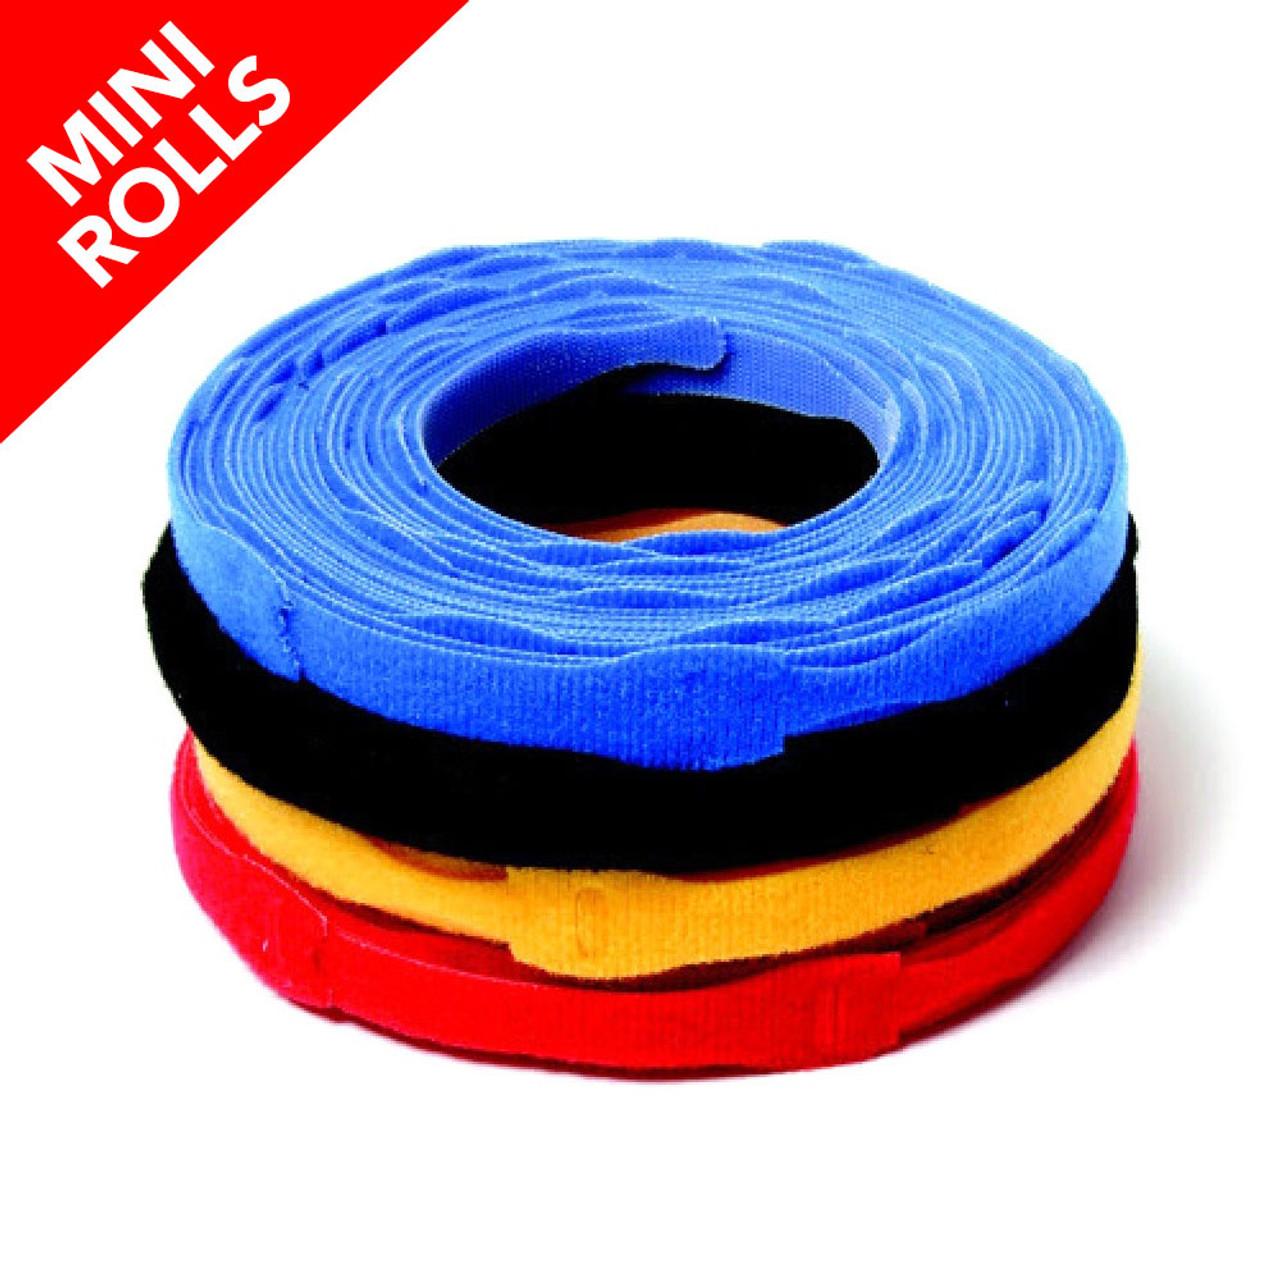 VELCRO ® Brand ONE-WRAP ® Die-Cut Straps - Mini Rolls